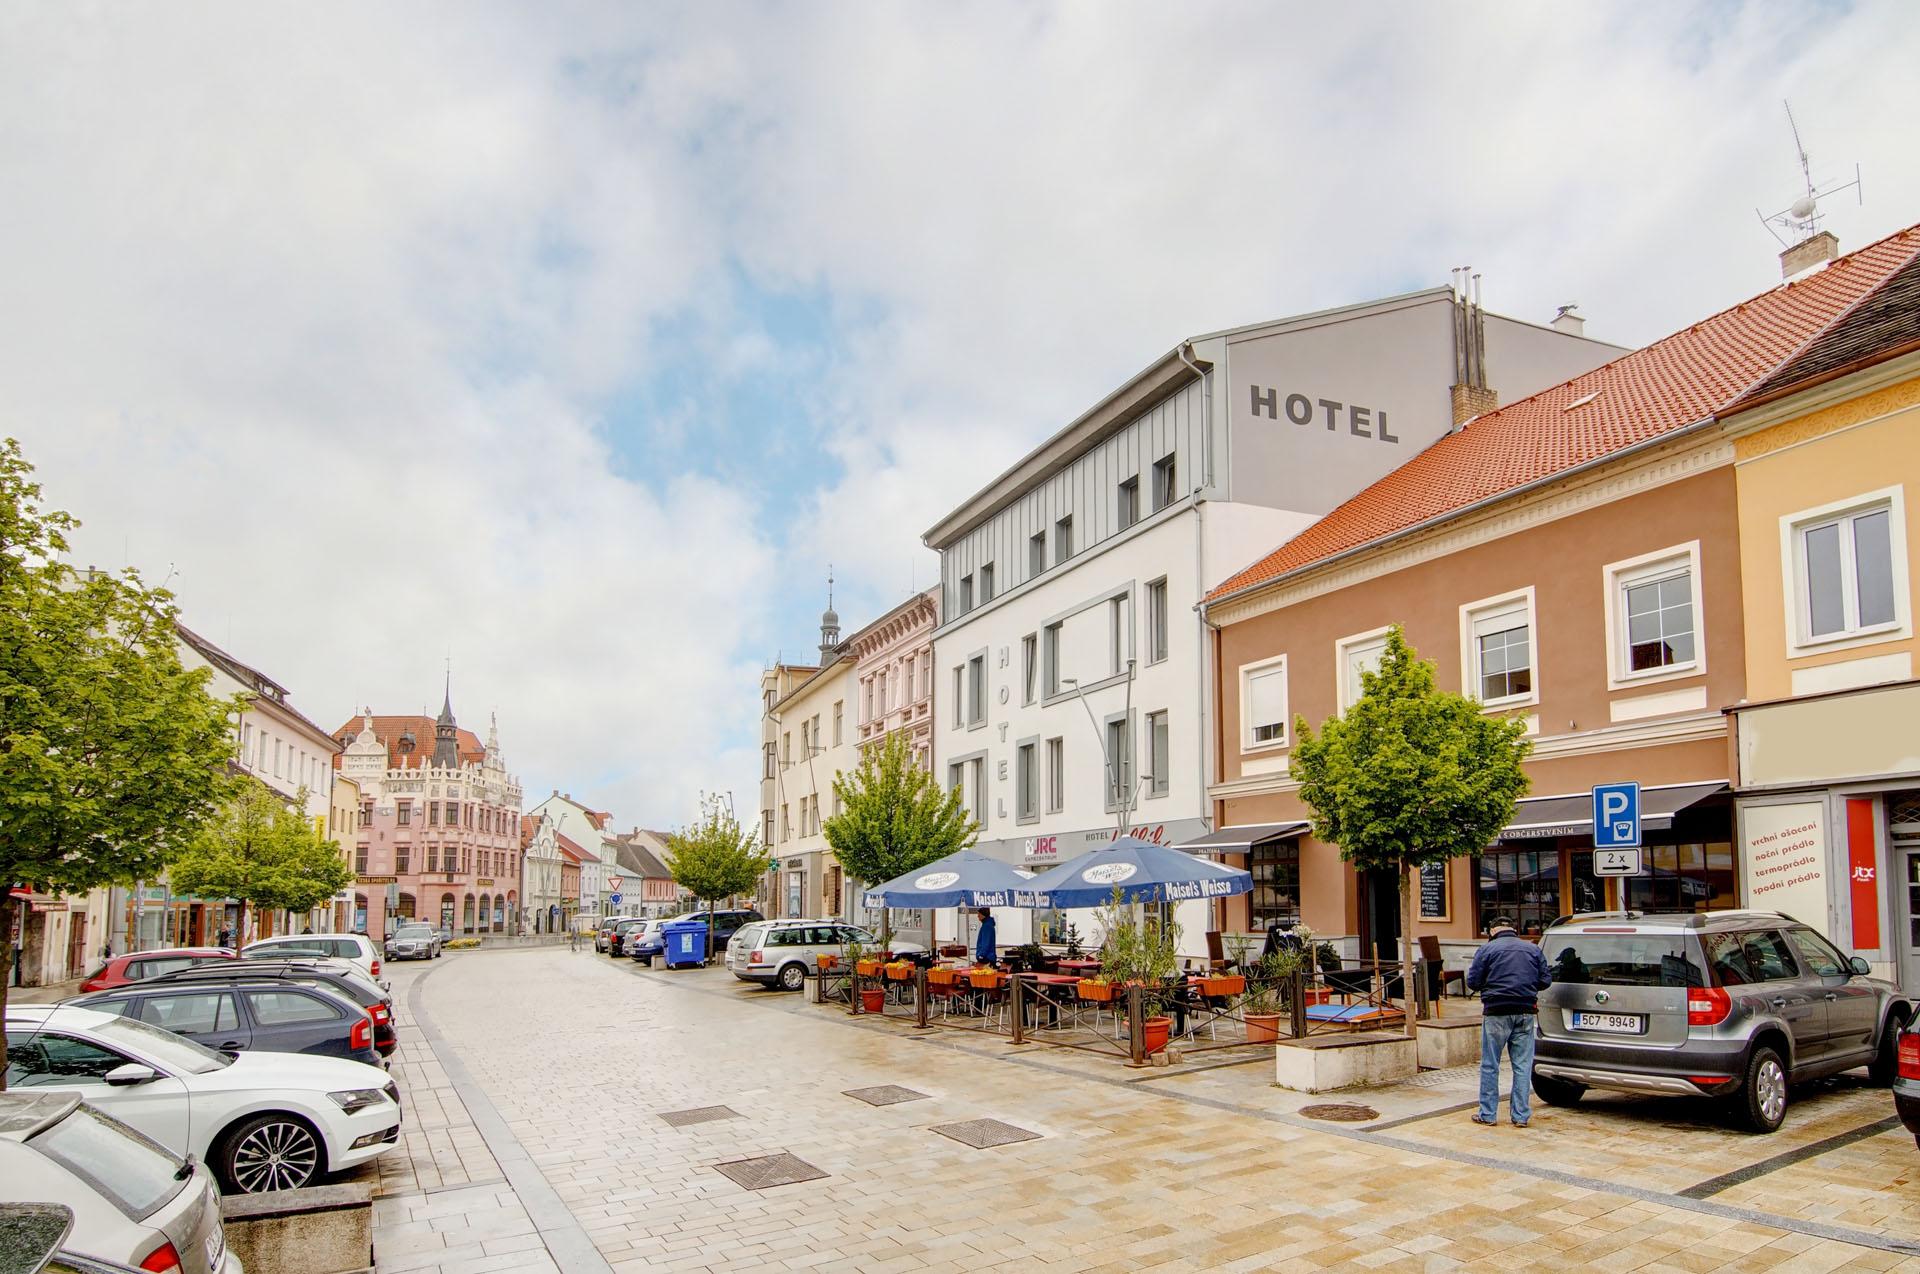 Hotel_Koflik_Strakonice_20190514_0026_